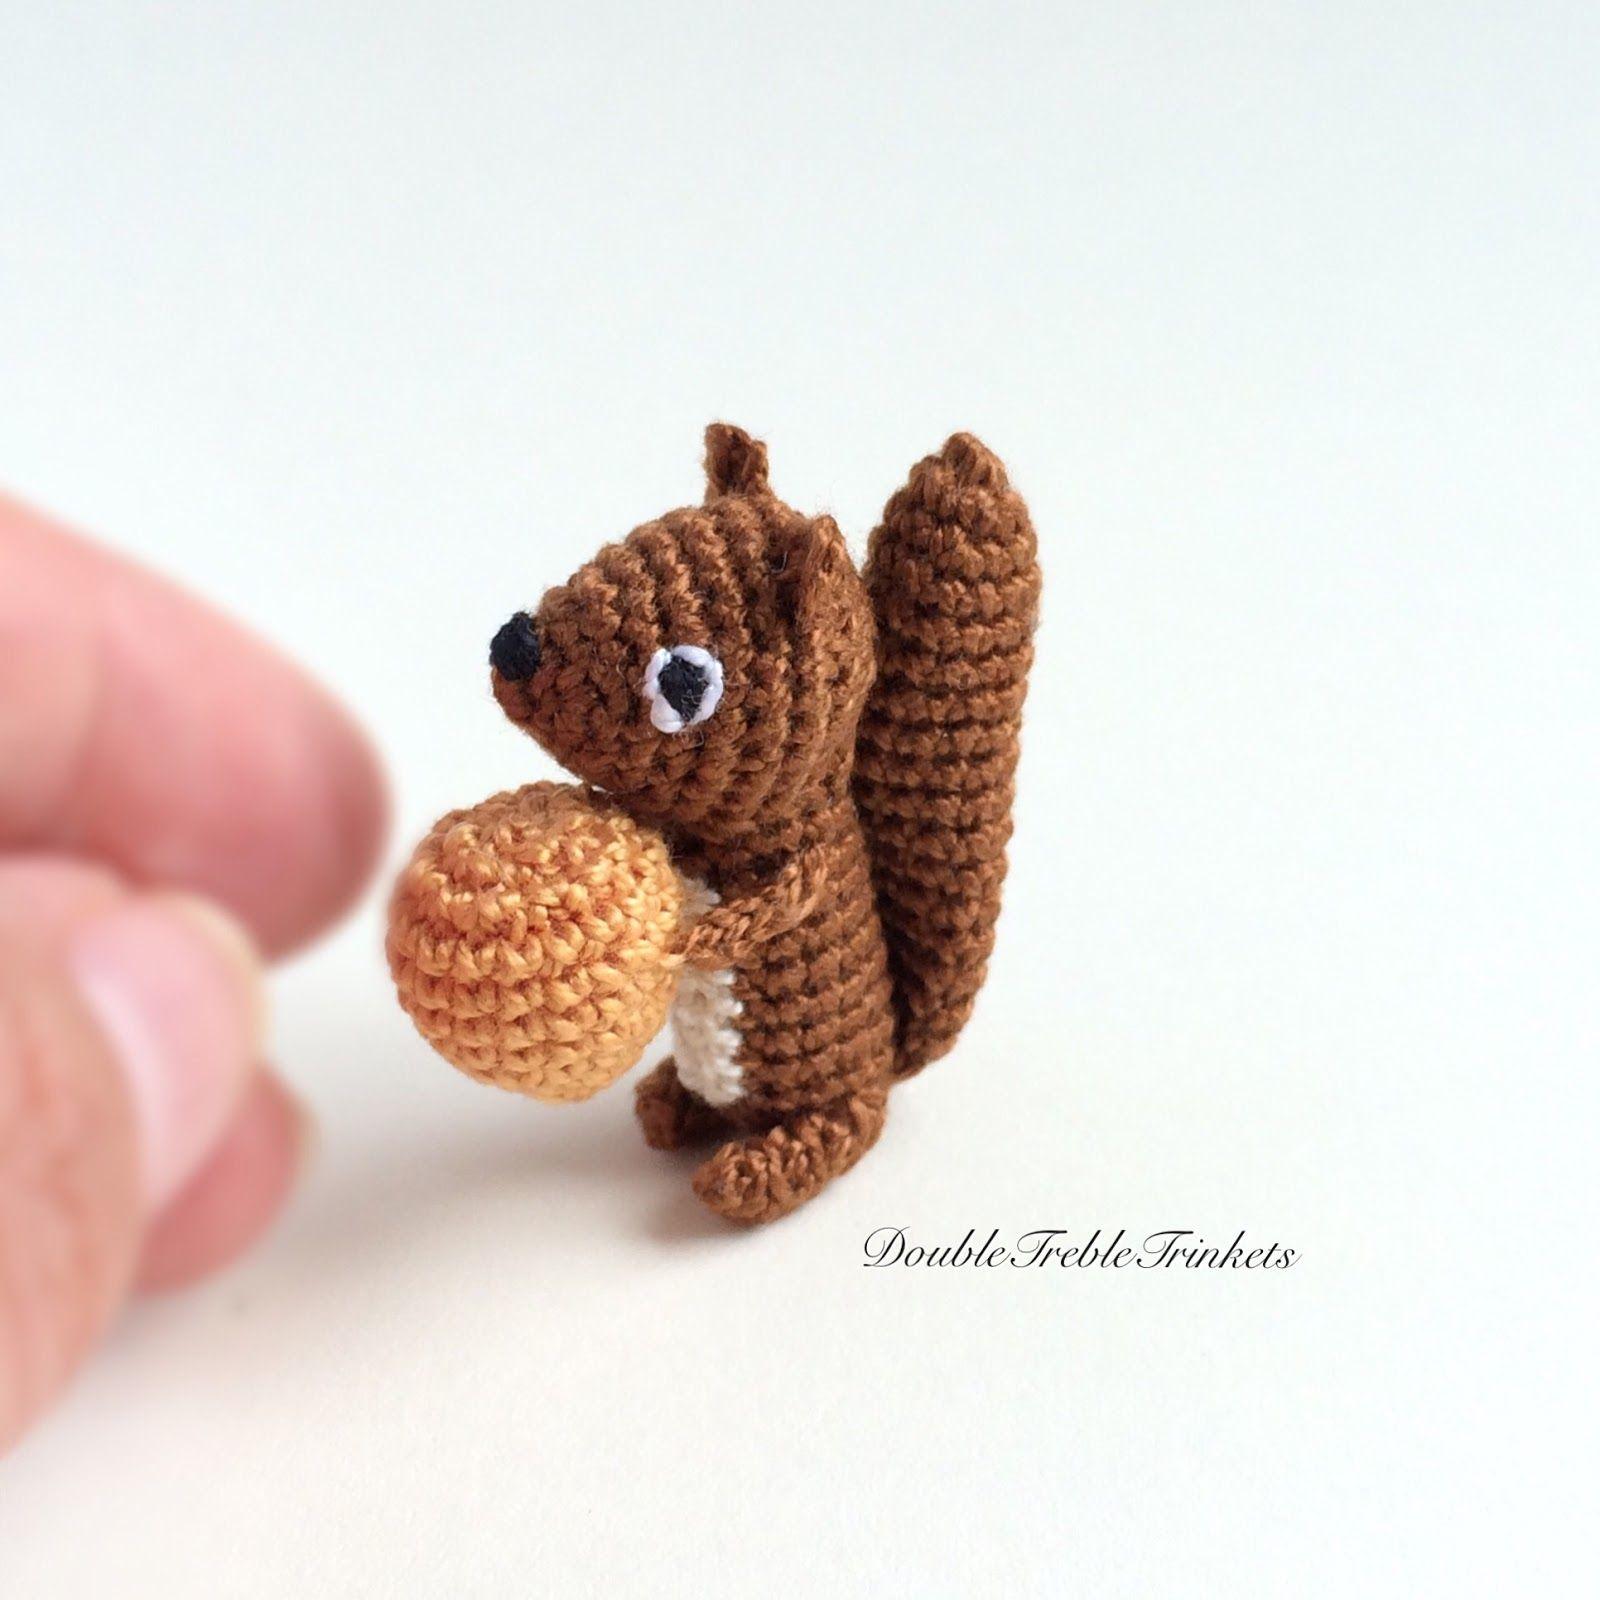 Microgurumi,Eichhörnchen , | jenny | Pinterest | Eichhörnchen ...